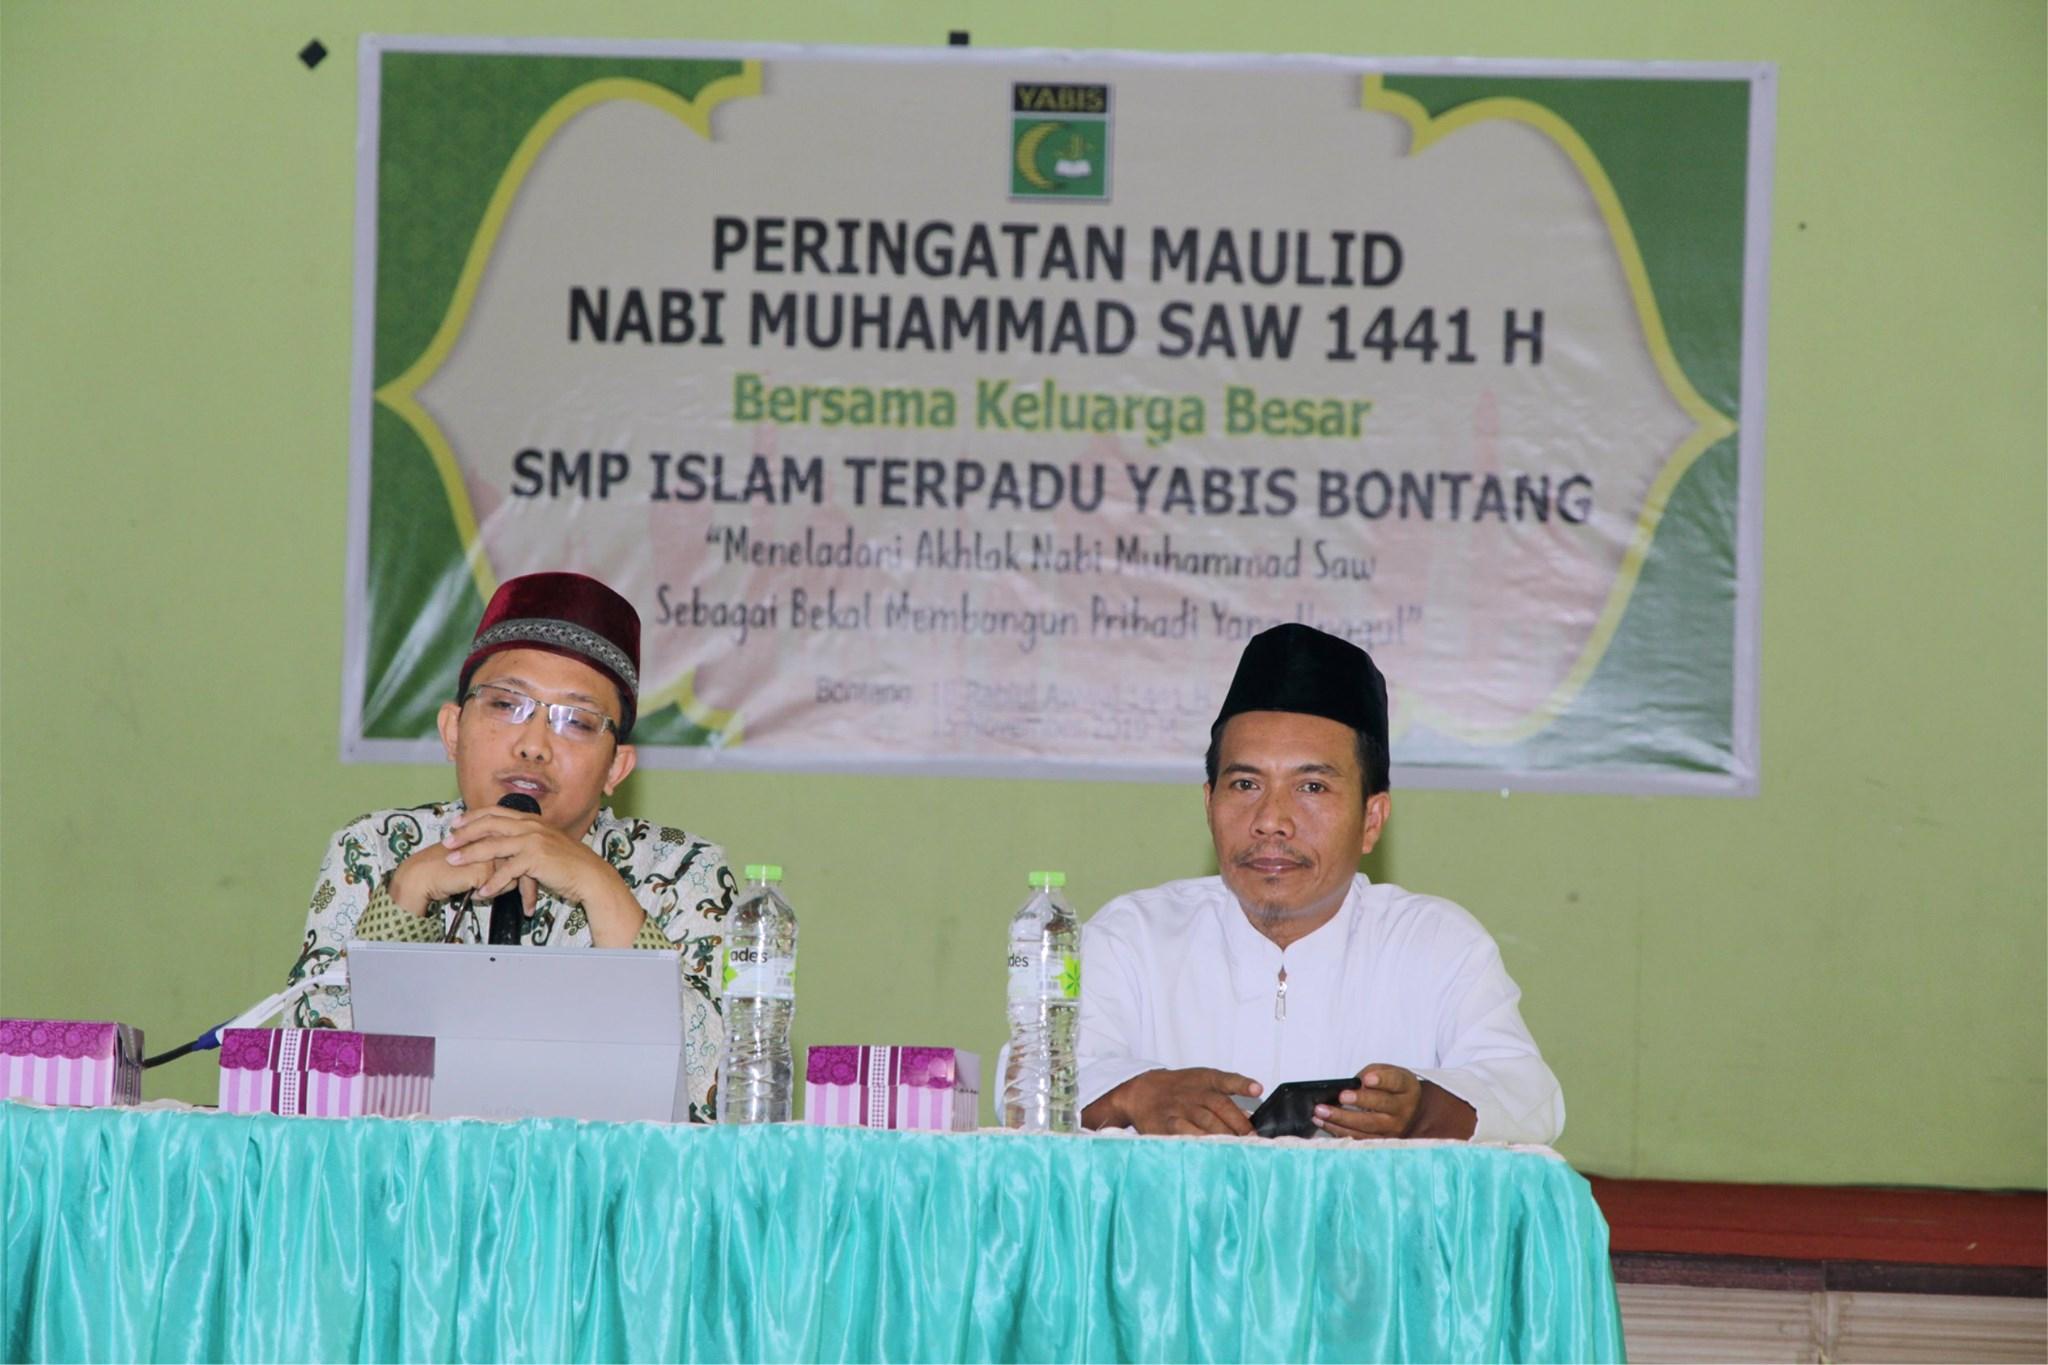 smp-it-yabis-maulid-nabi-muhammad-saw(1).jpg